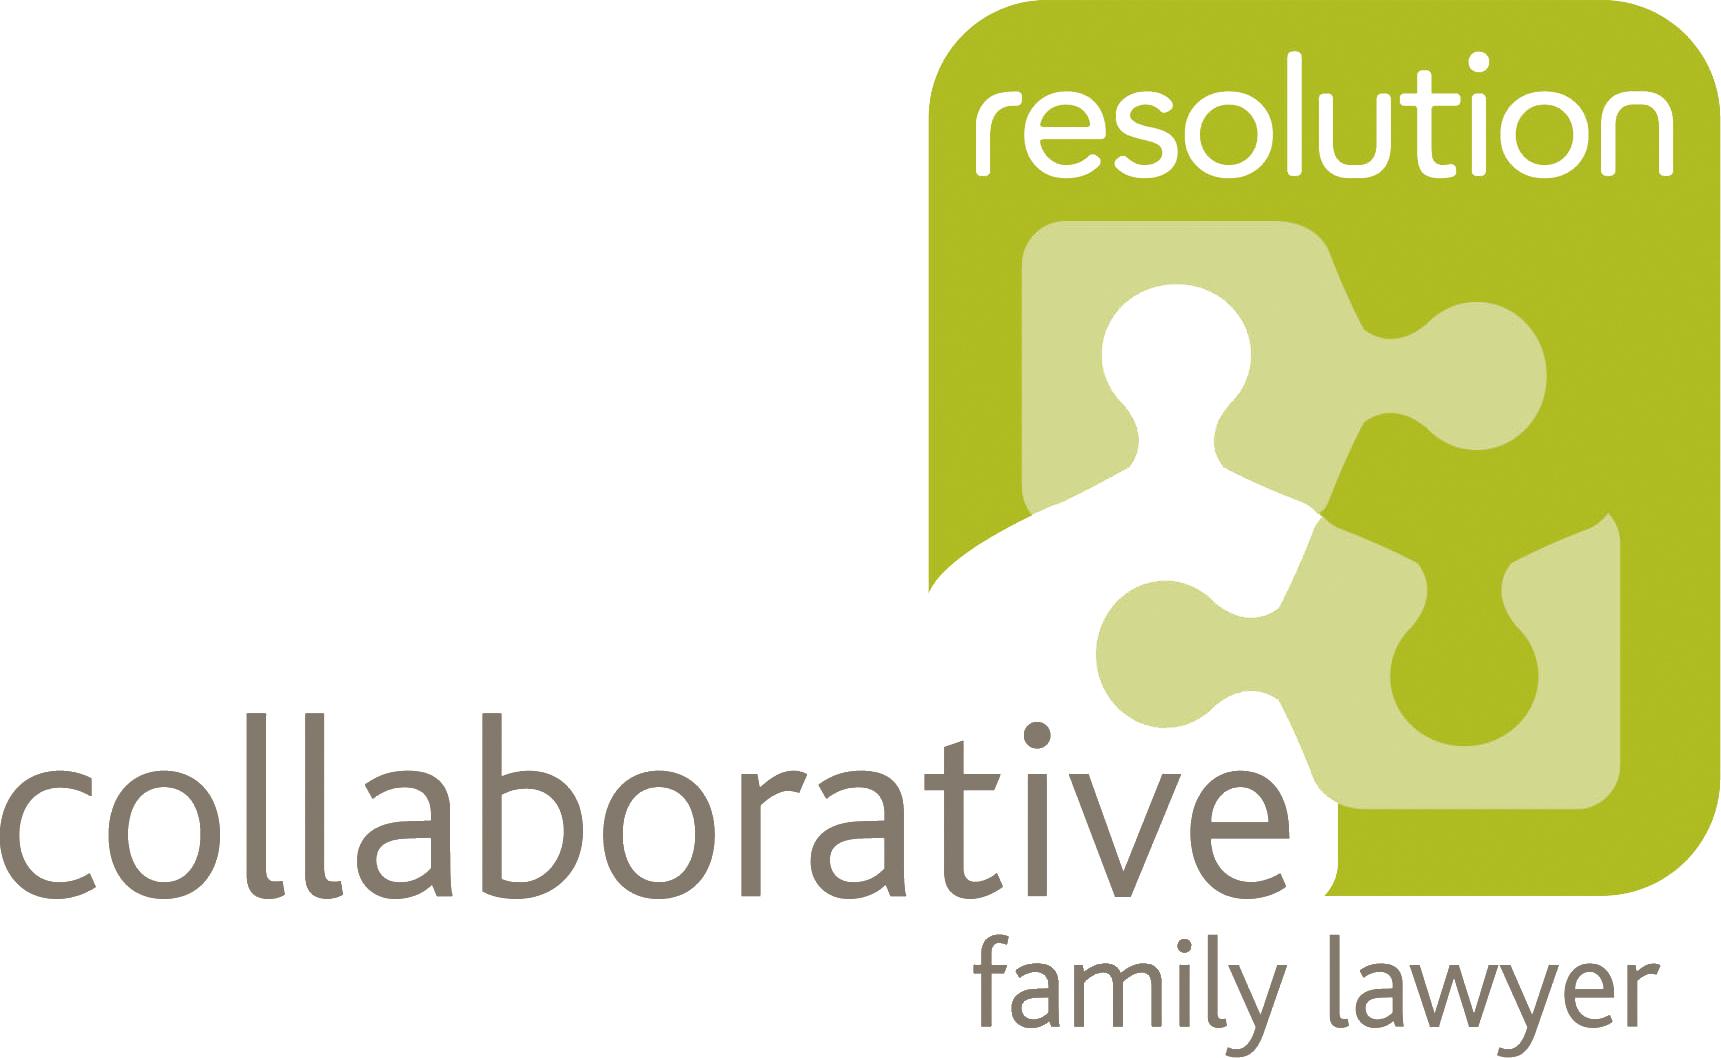 Res_collab_logo_RGB